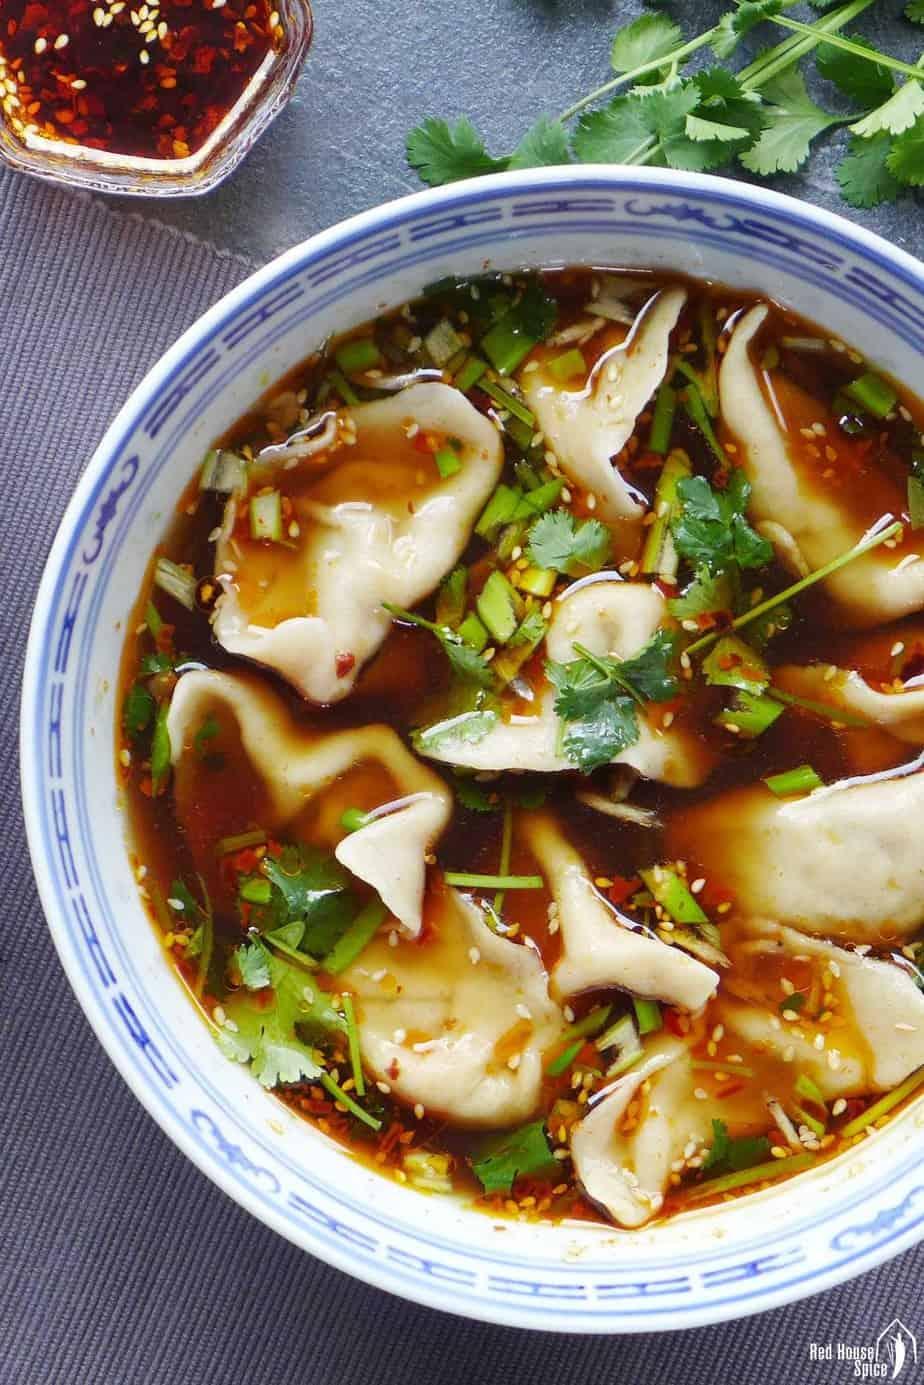 Beef dumplings in hot & sour soup